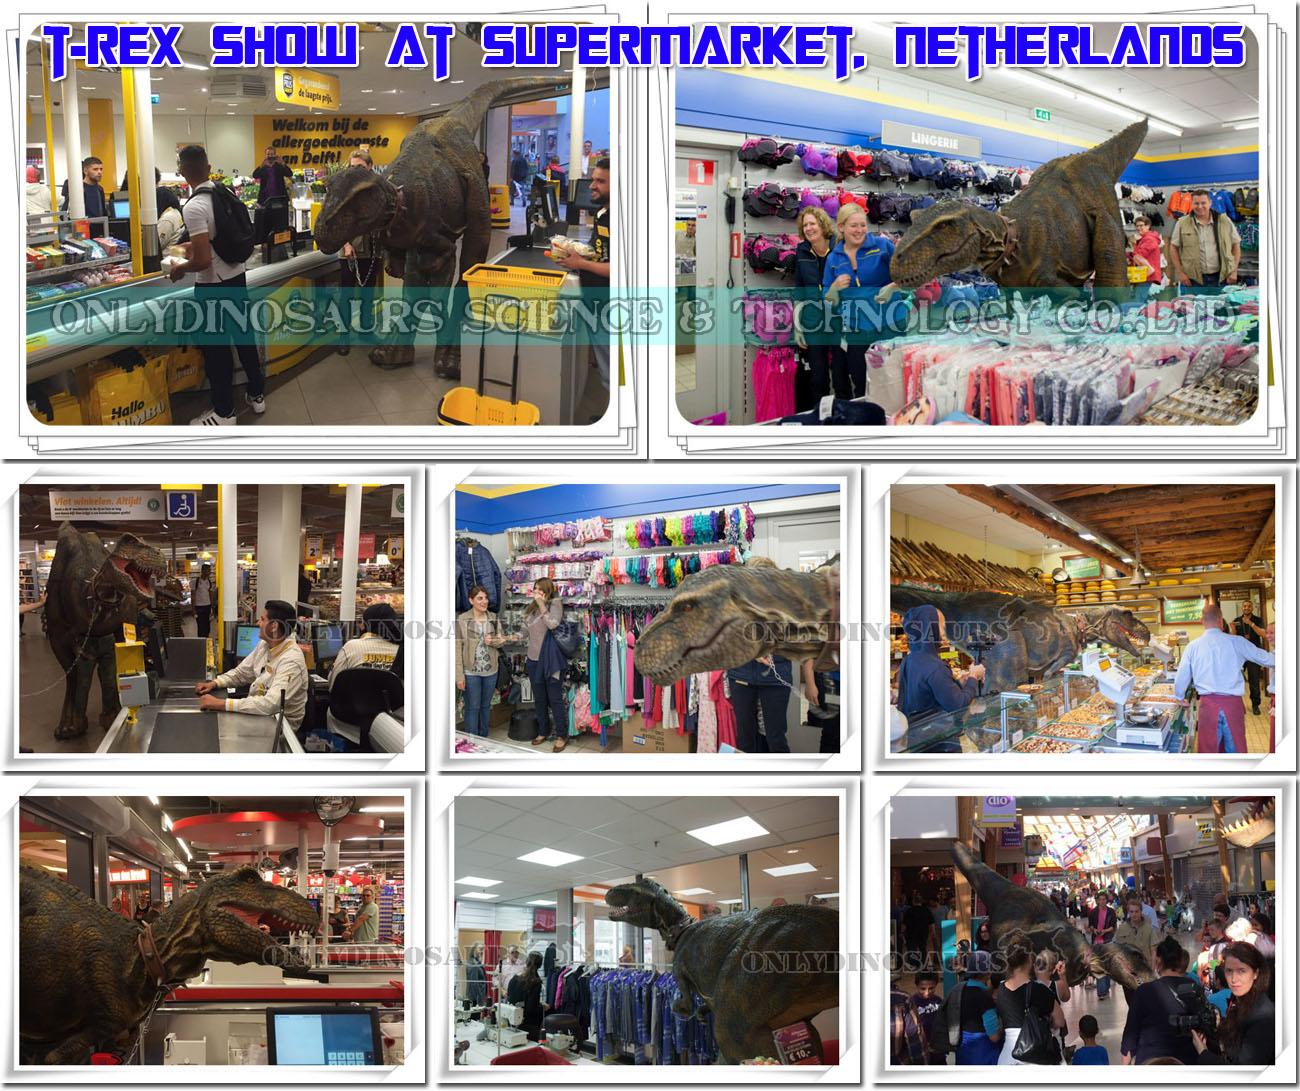 Walking Dinosaur Show at Supermarket